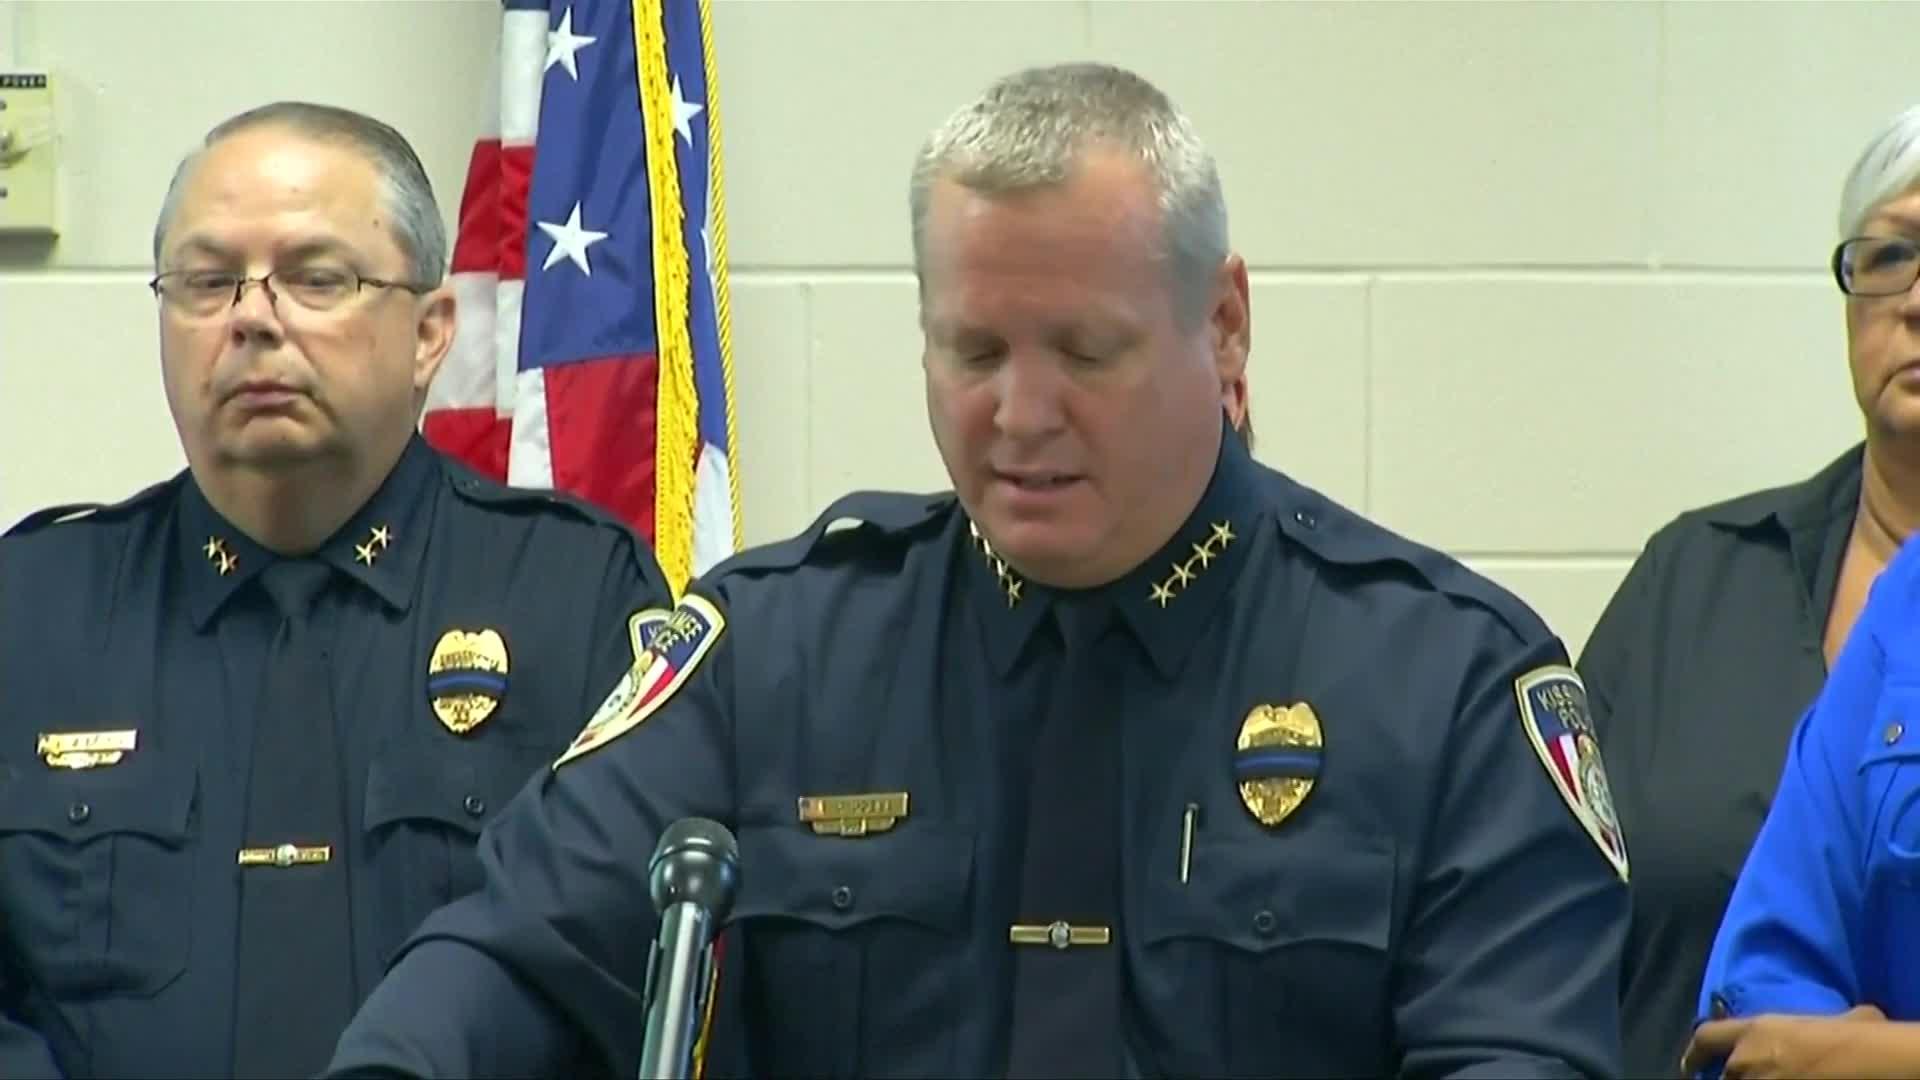 2 Florida police officers fatally shot, suspect arrested